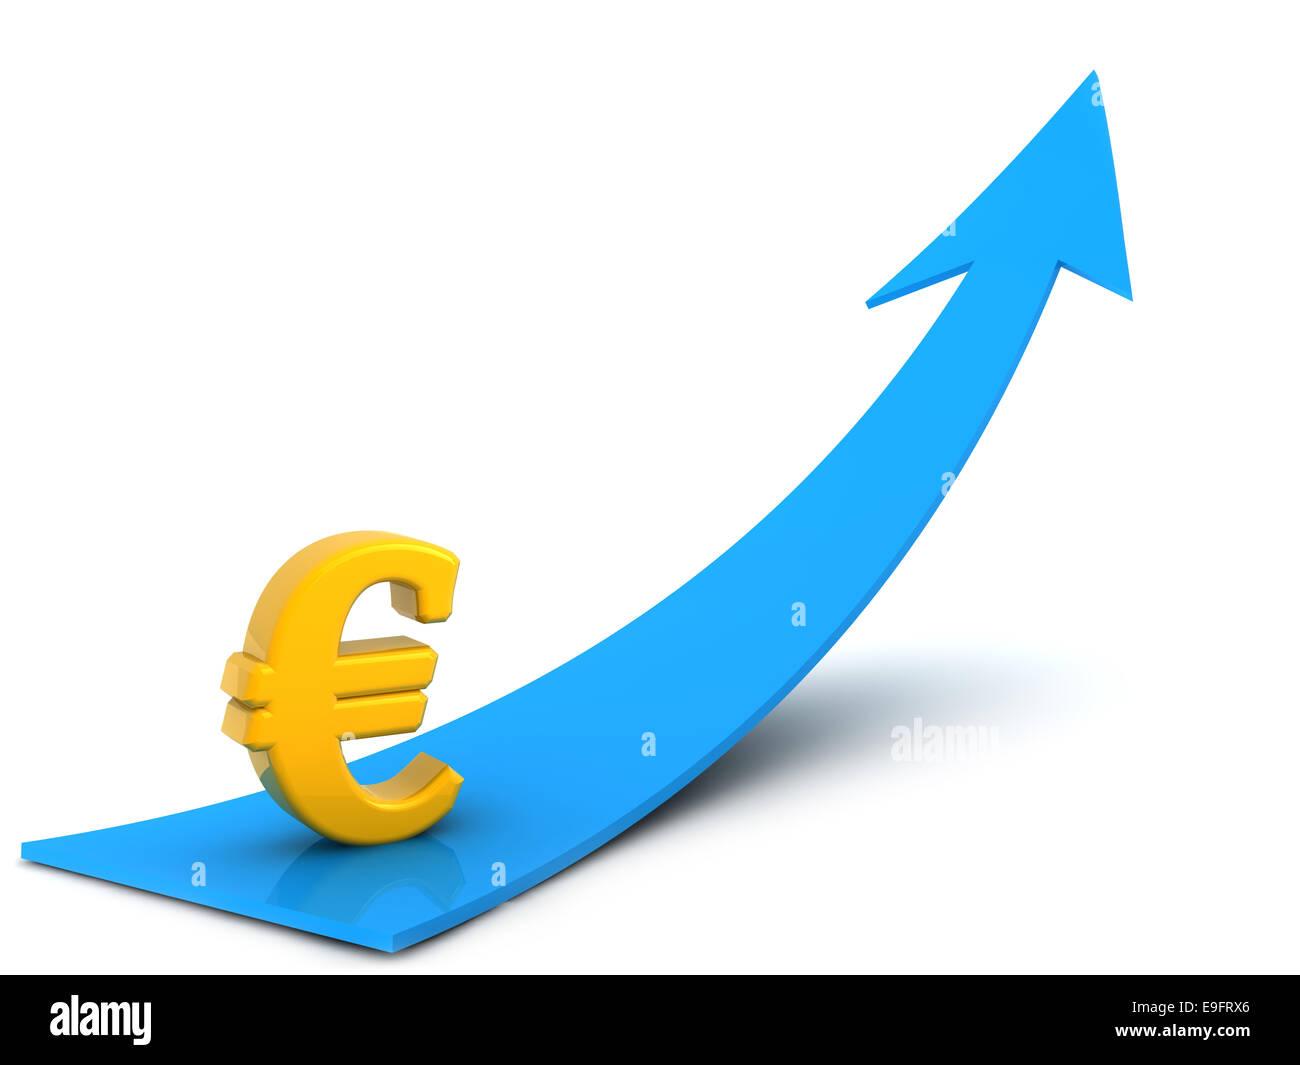 € symbol on blue arrow shape, digitally generated image. - Stock Image